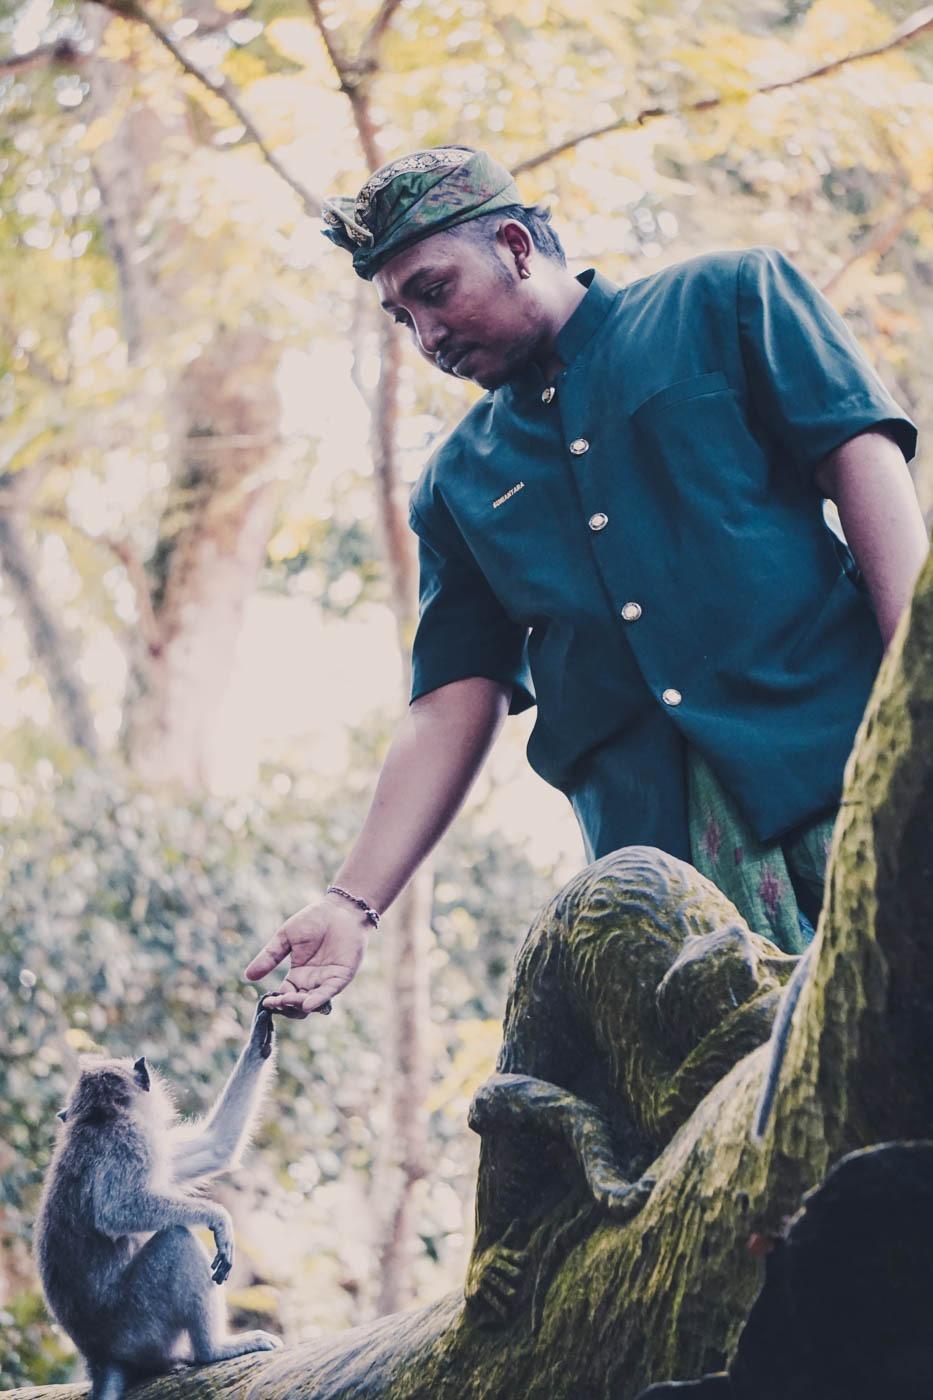 Ubud Monkey Forest - Bali Itinerary #traveldestinations #bali #beautifulplaces